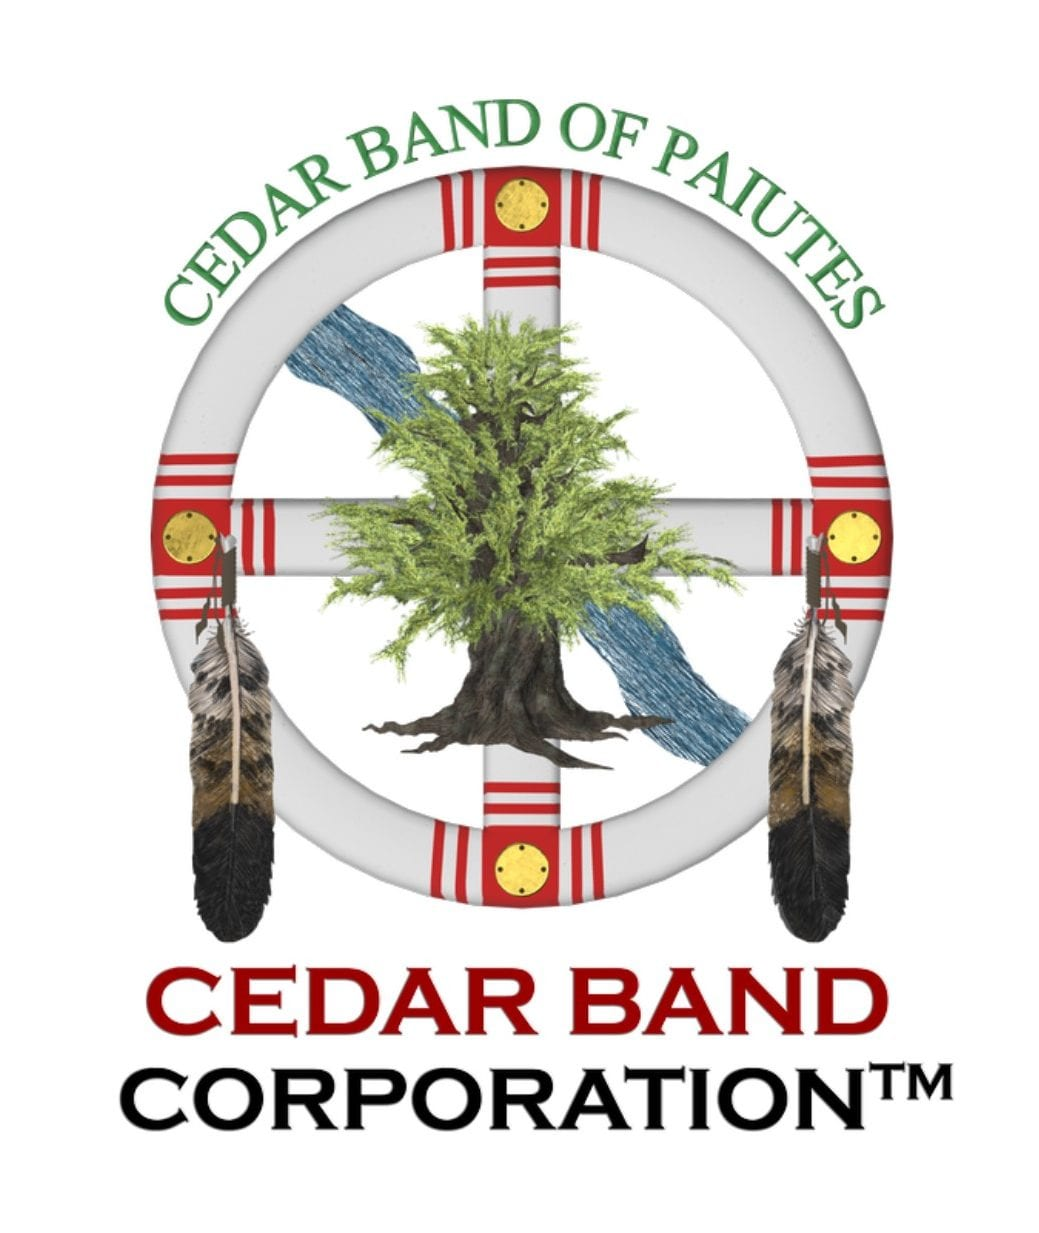 Cedar Band Corporation